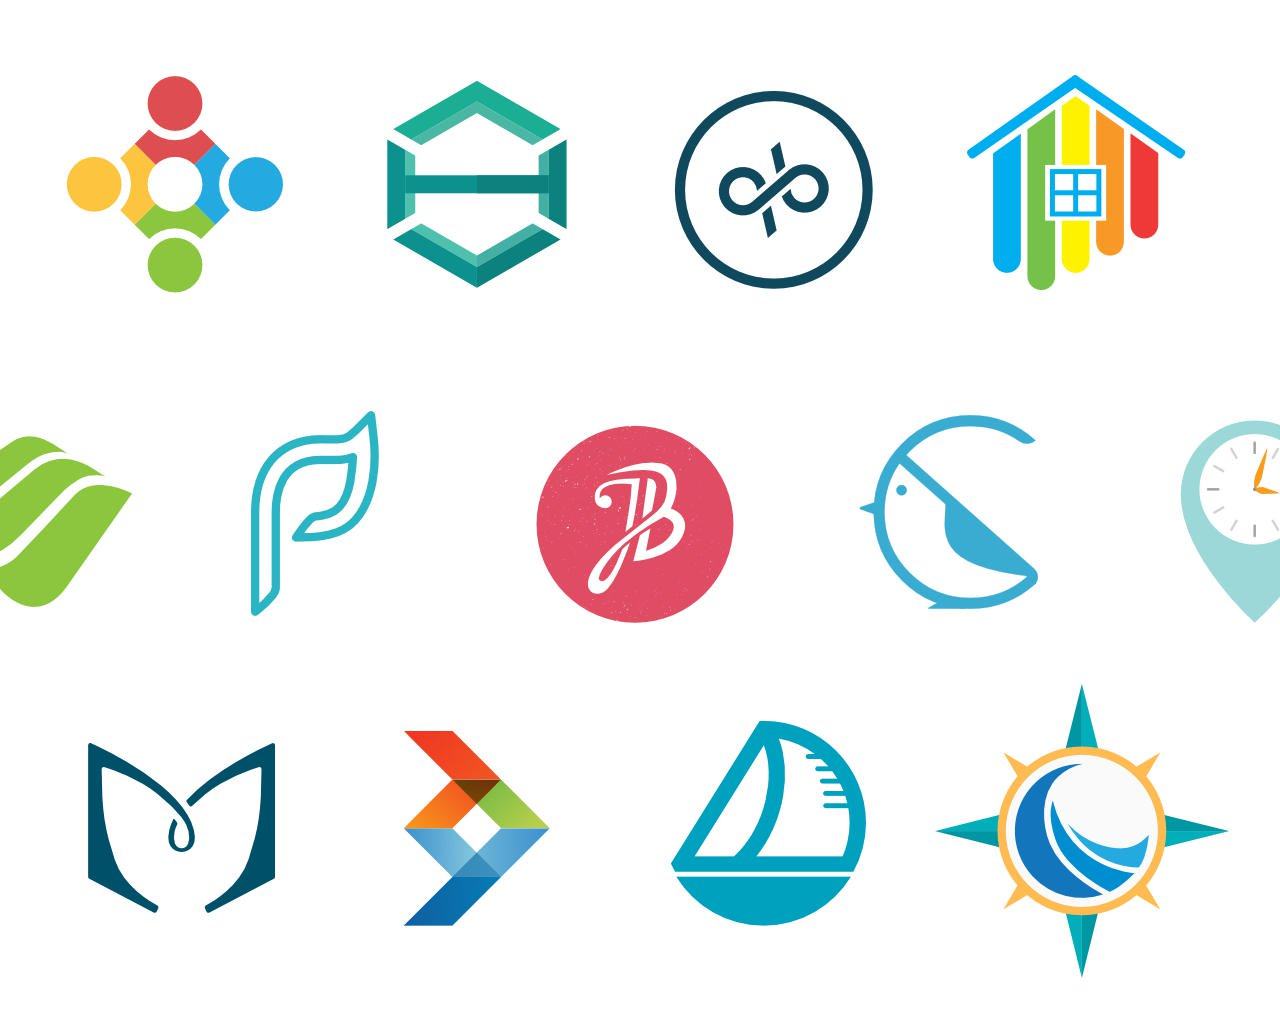 Logo design apps free